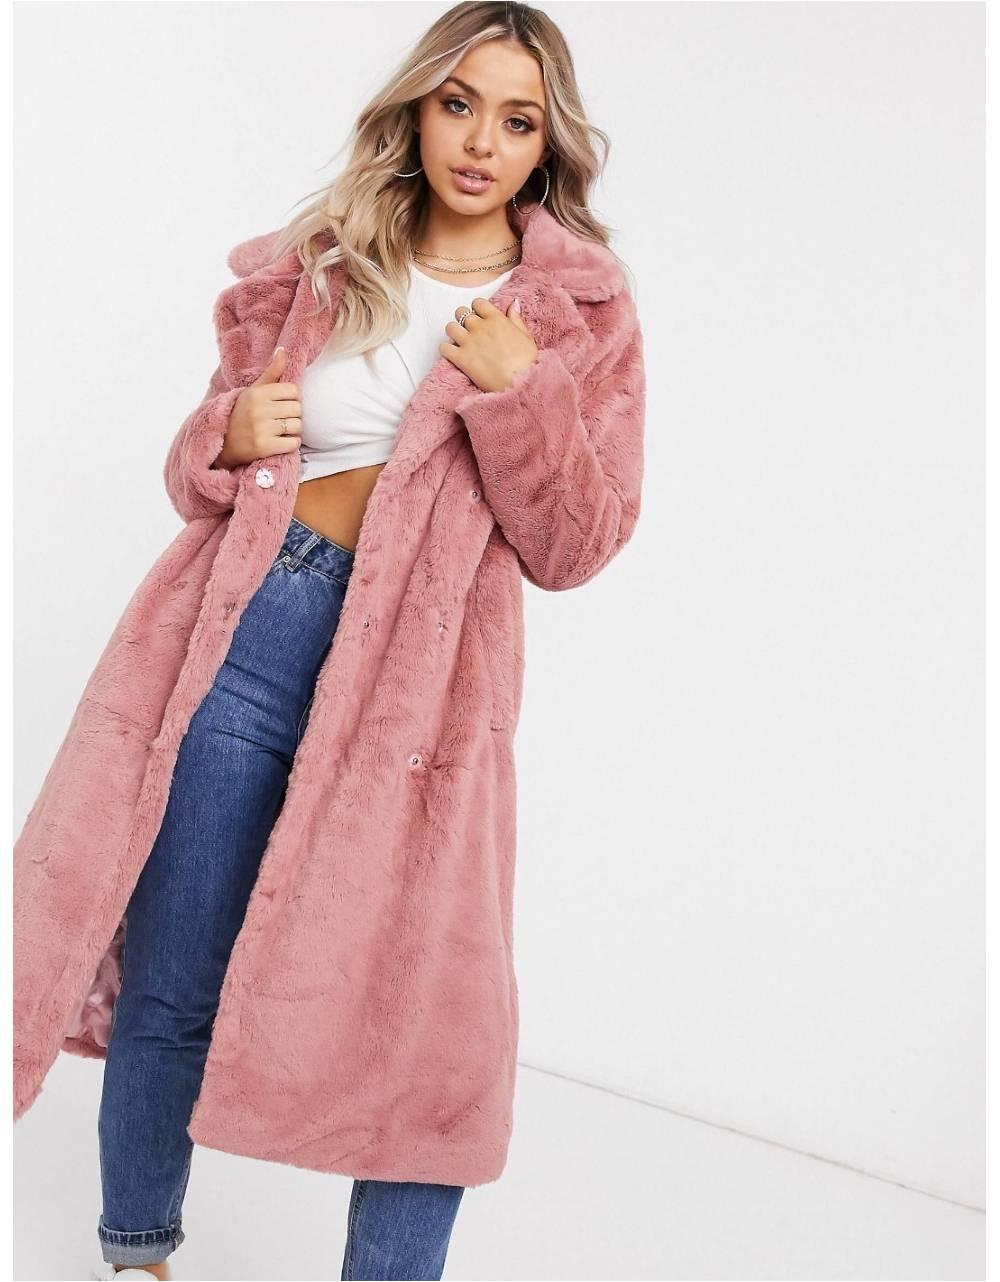 NA-KD faux fur coat - dusty rose NA-KD Coat 114,75€